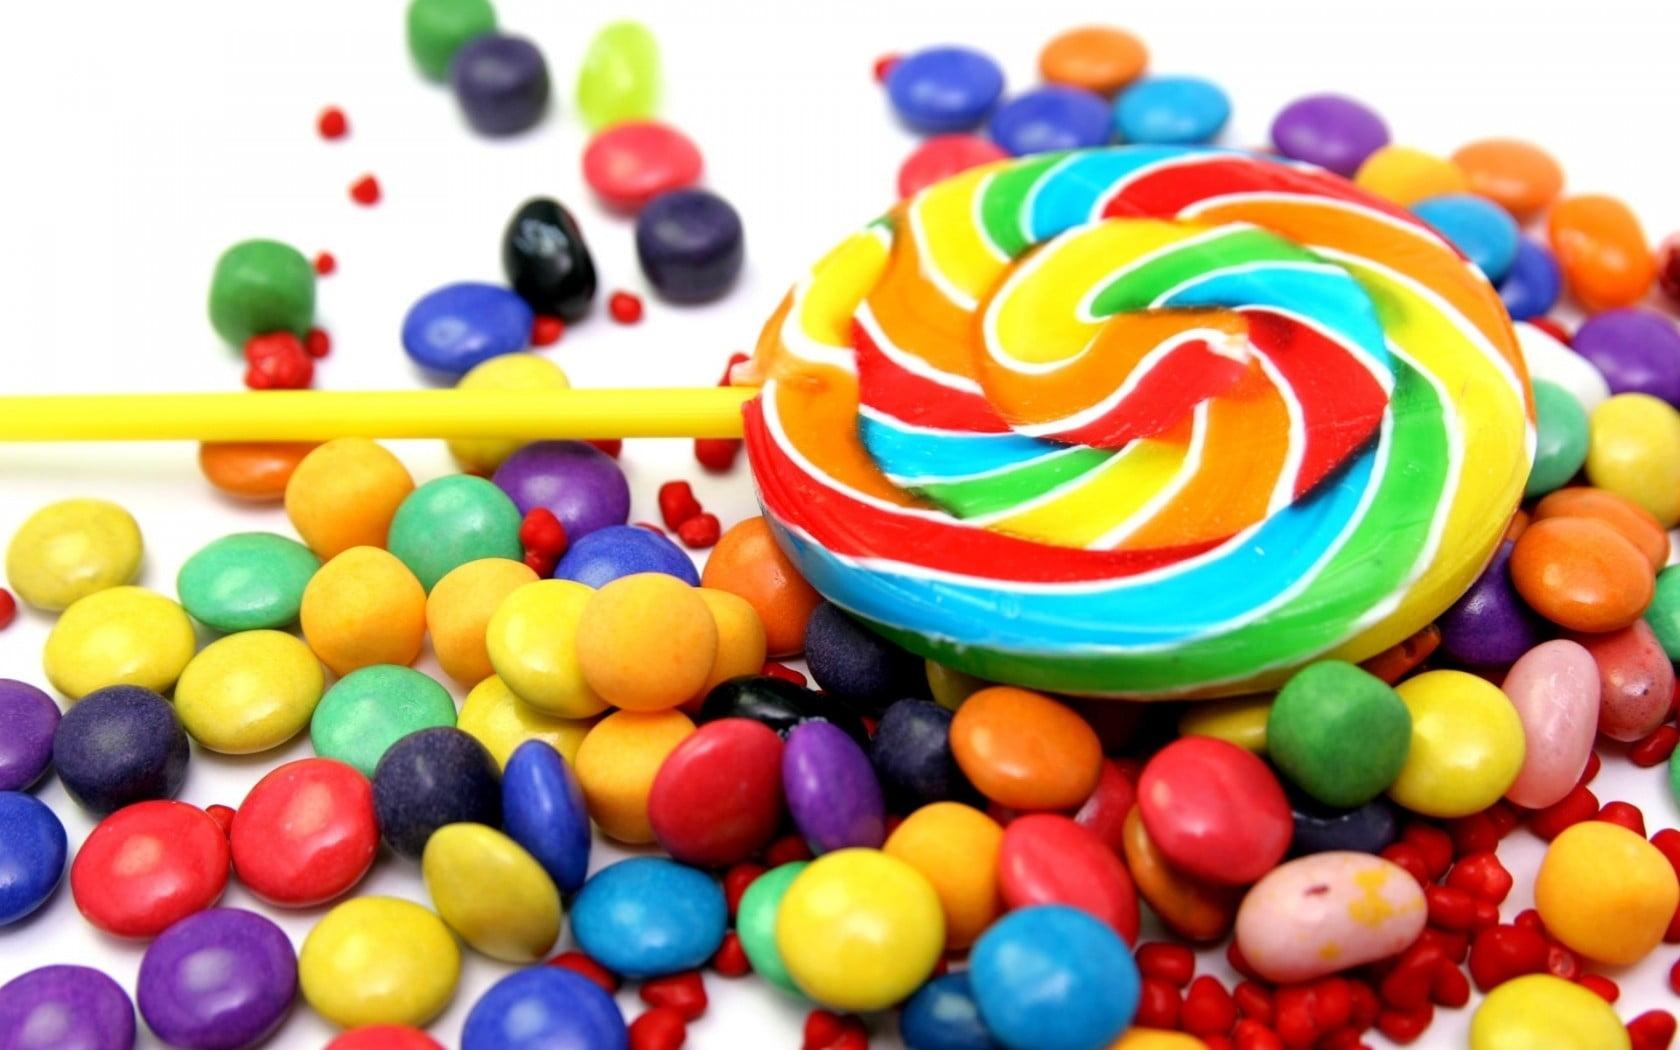 Multicolored lollipop HD wallpaper Wallpaper Flare 1680x1050